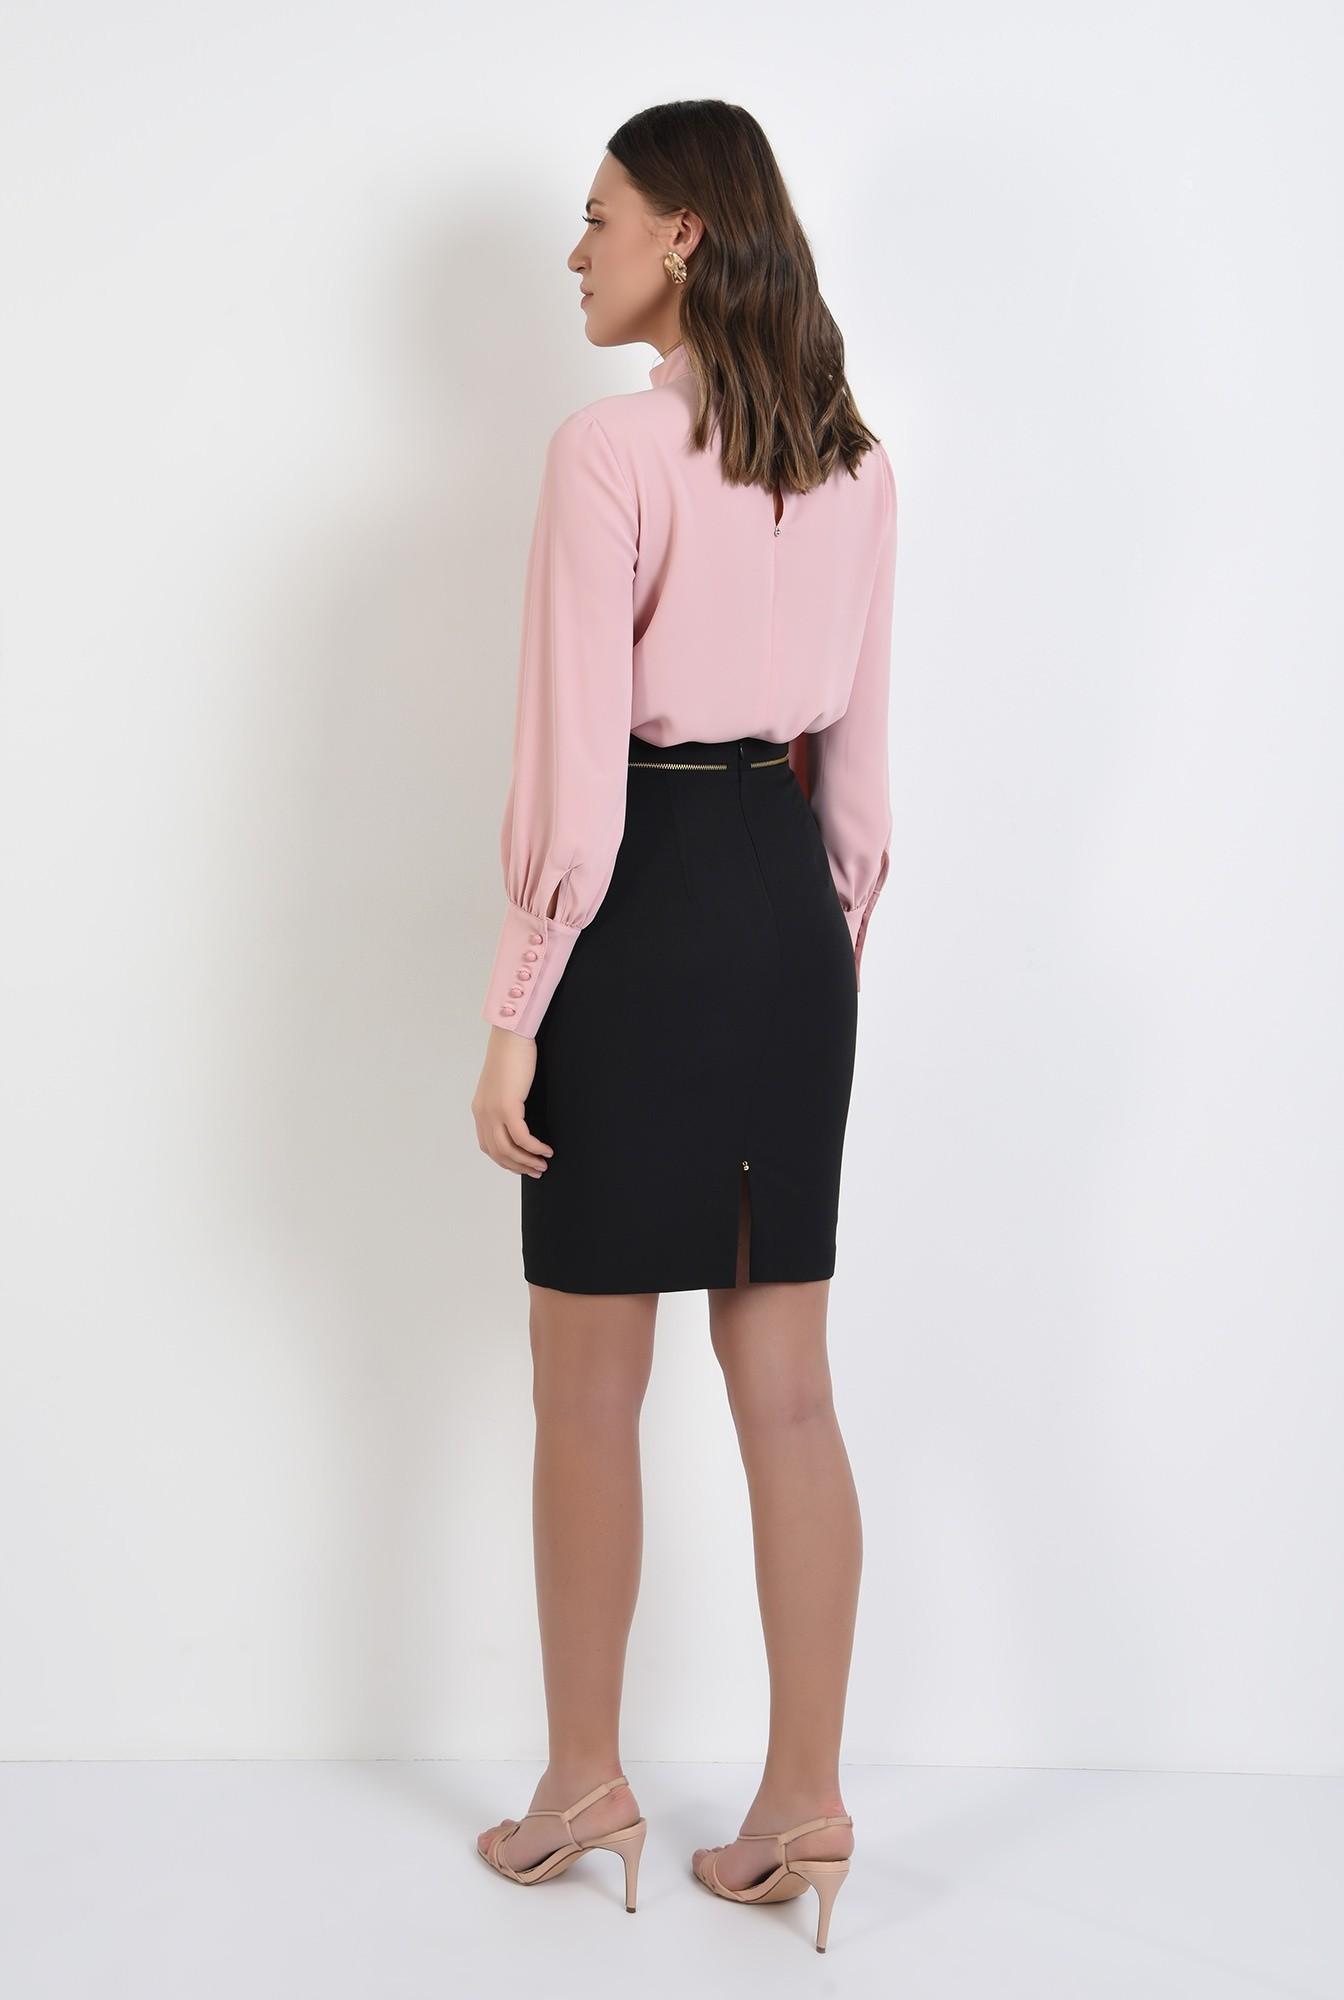 1 -  bluza office, roz, guler perkins, maneci lungi, Poema